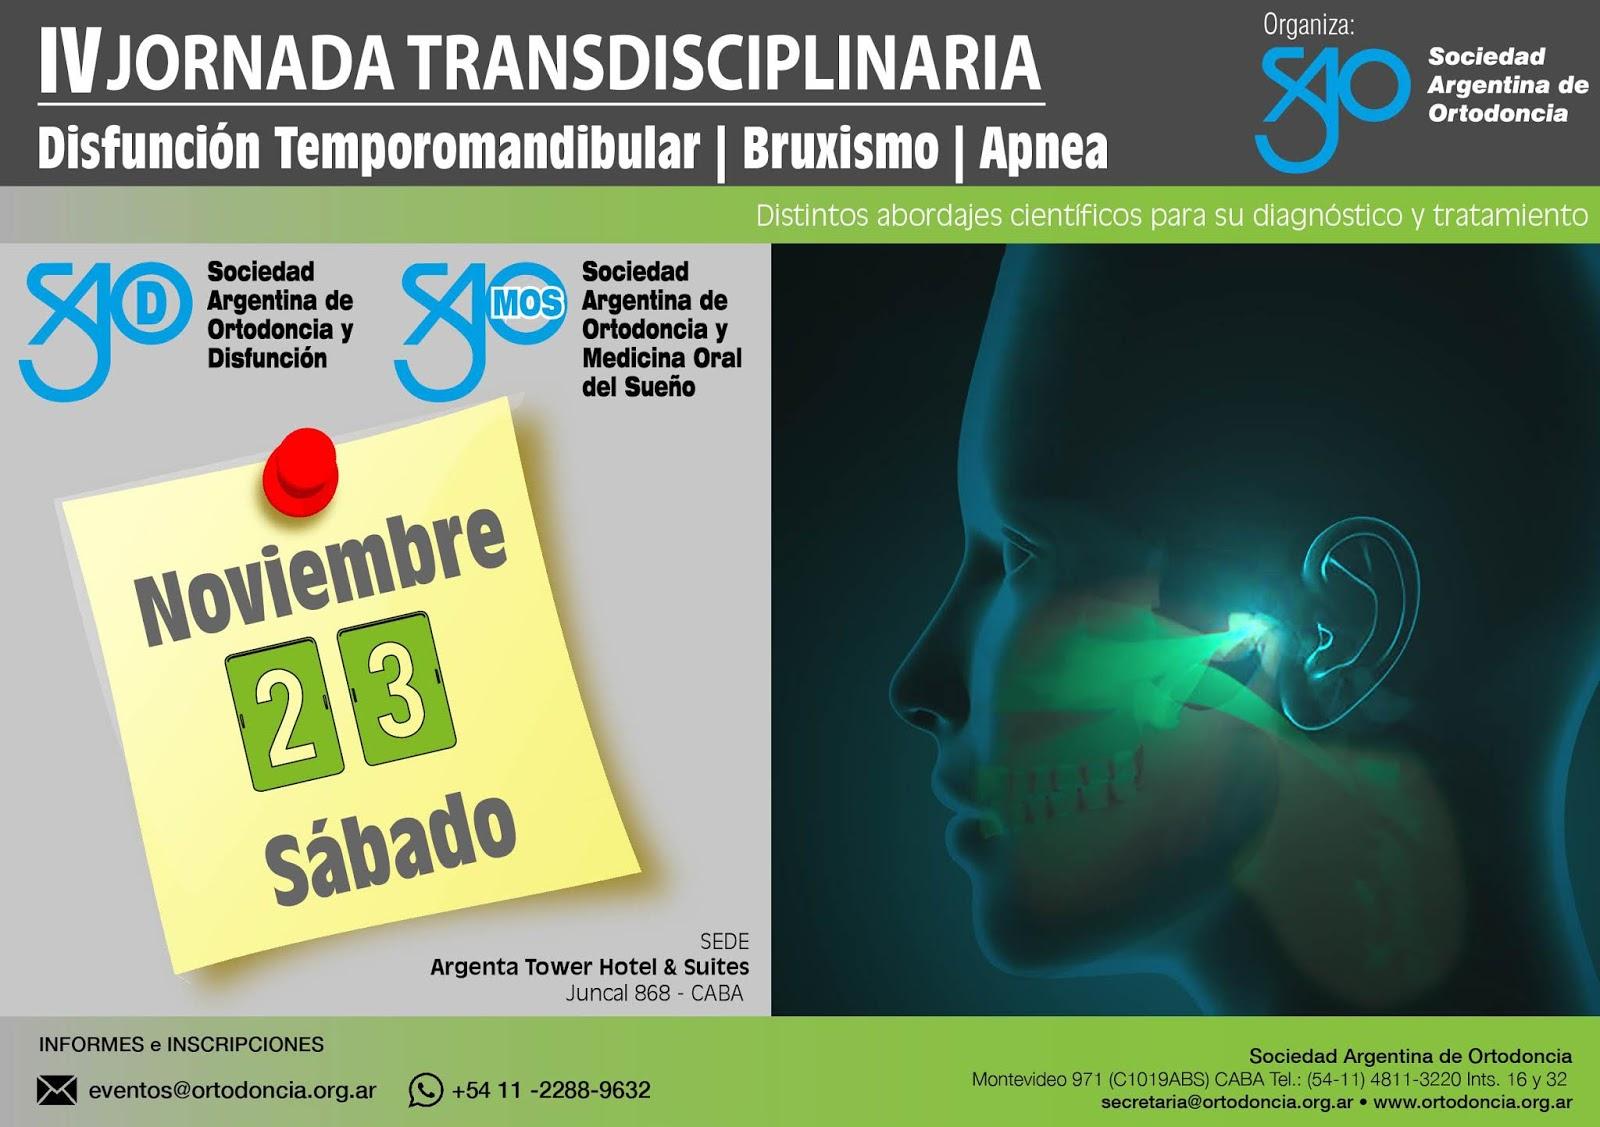 IV Jornada Transdisciplinaria